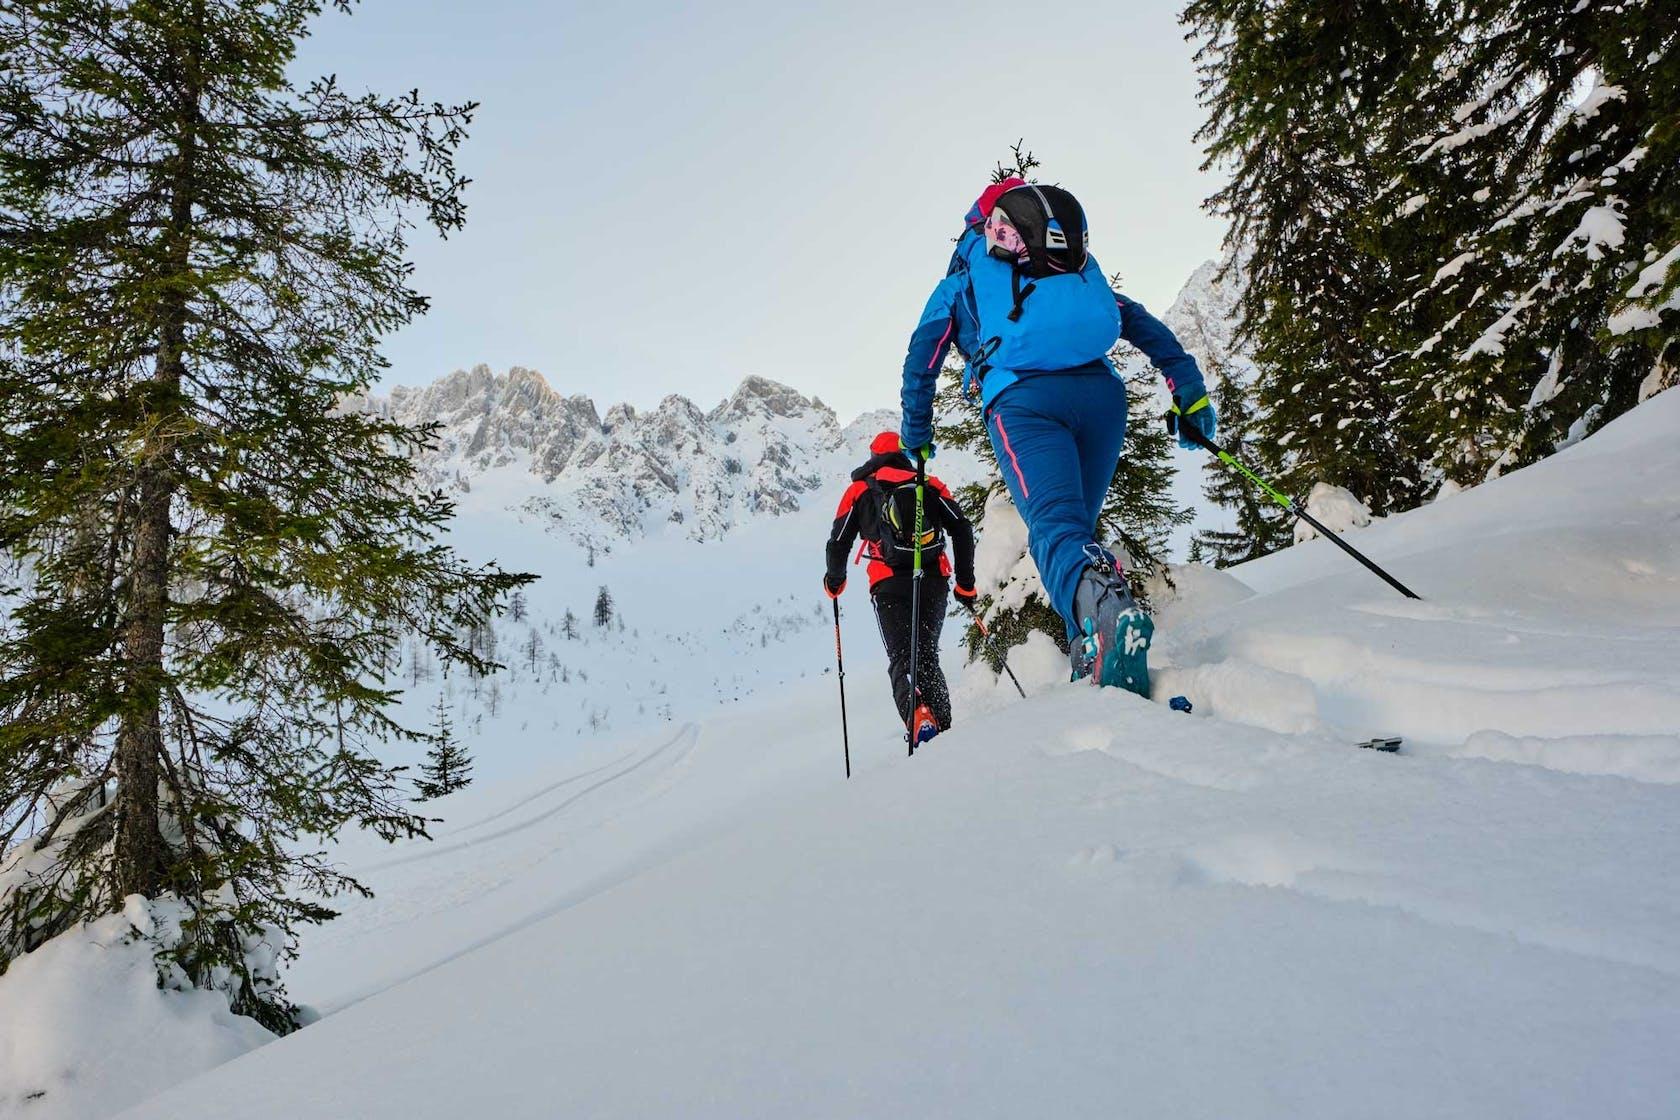 dynafit skitourenskier